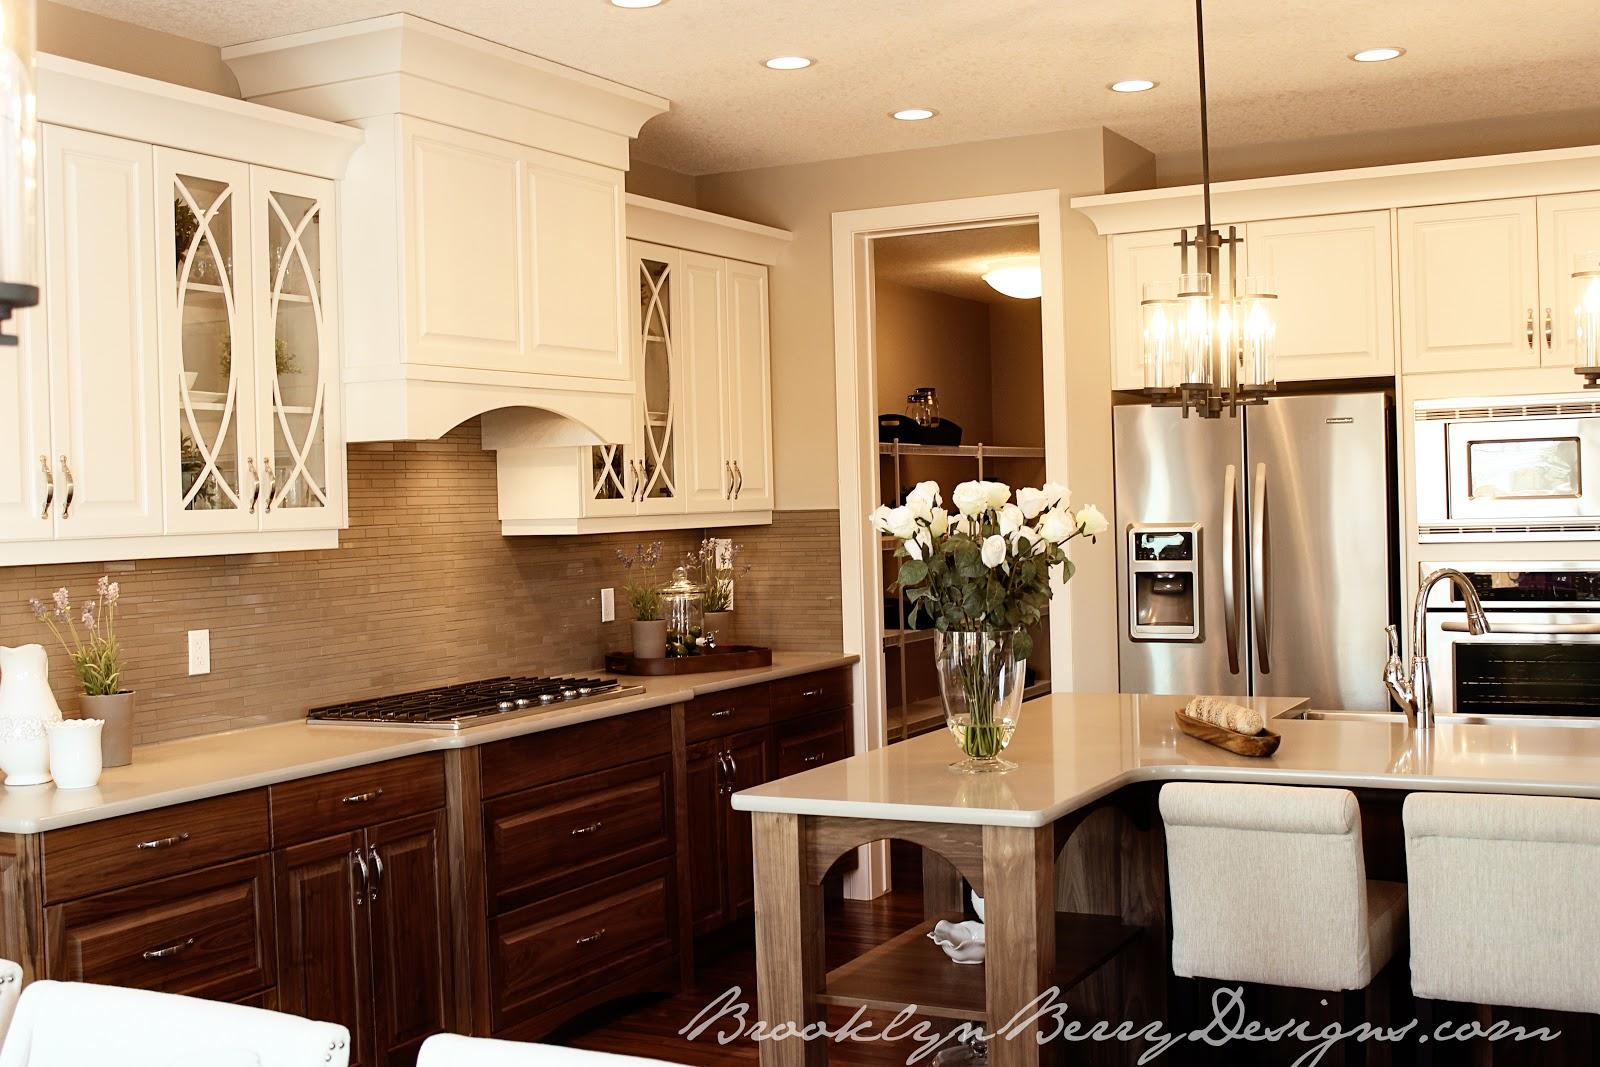 aspen ii showhome in cranston dream kitchen design brooklyn berry designs. Black Bedroom Furniture Sets. Home Design Ideas